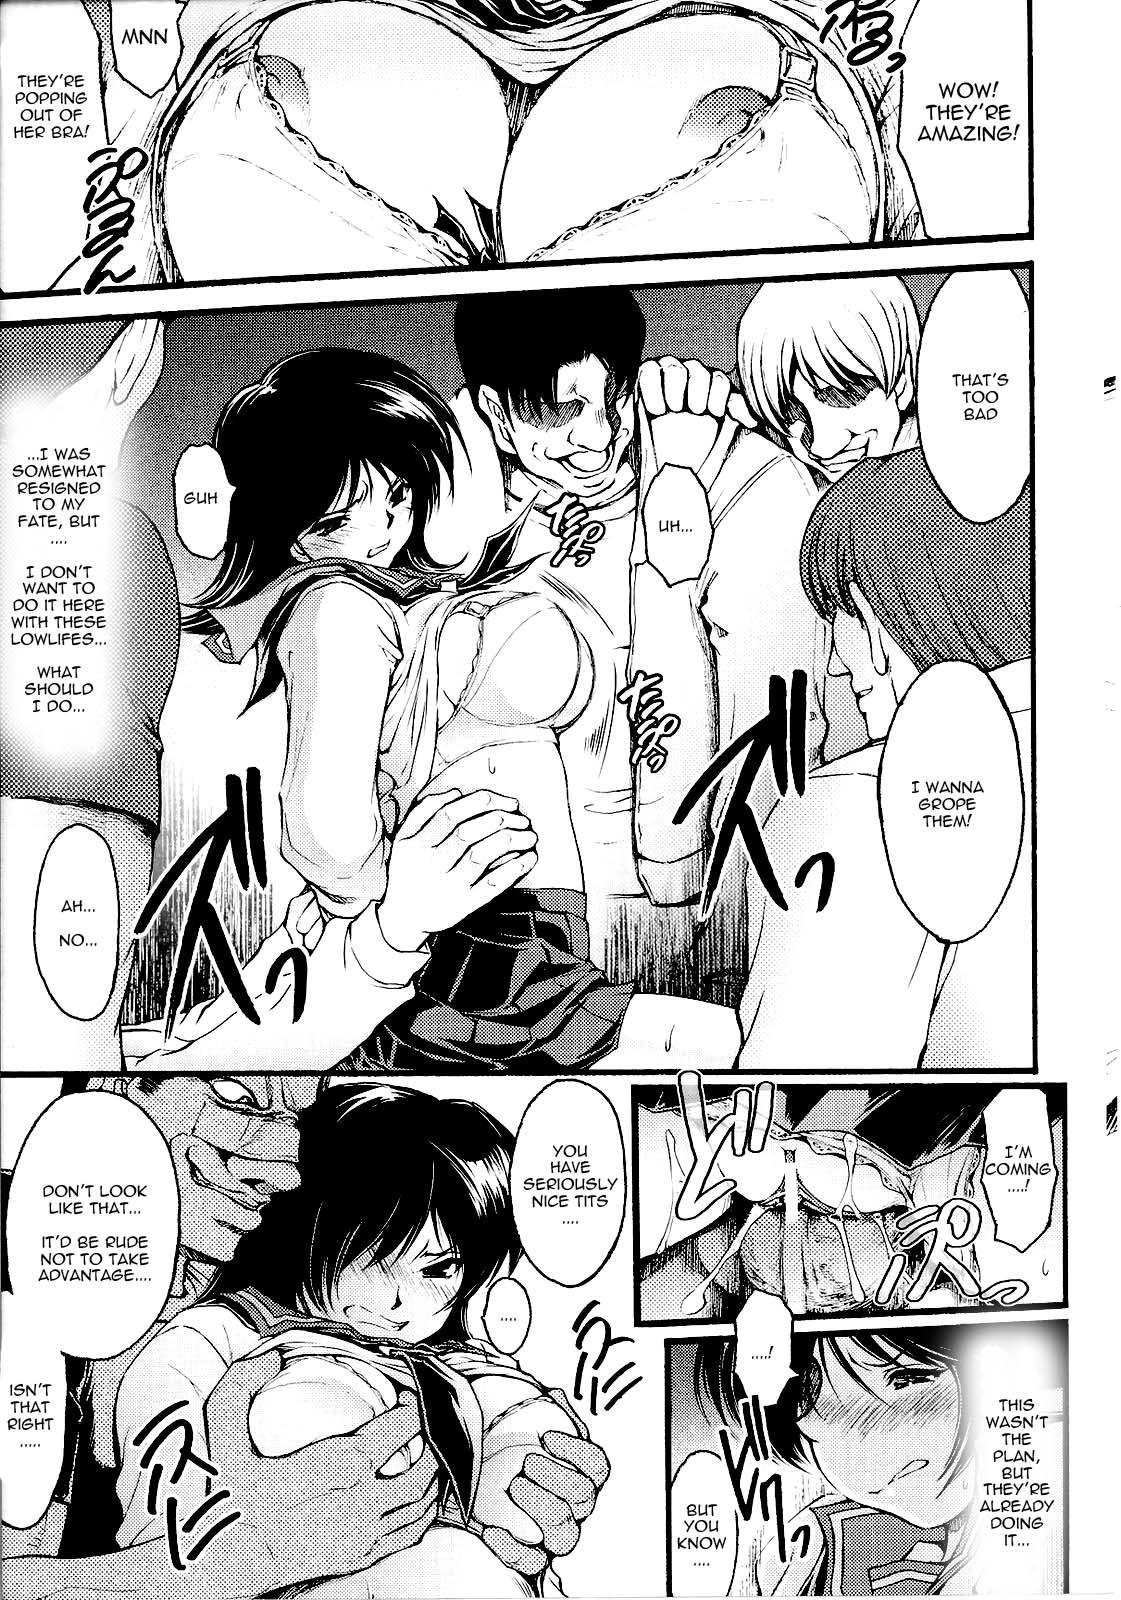 Itzuka-san's Case File 20